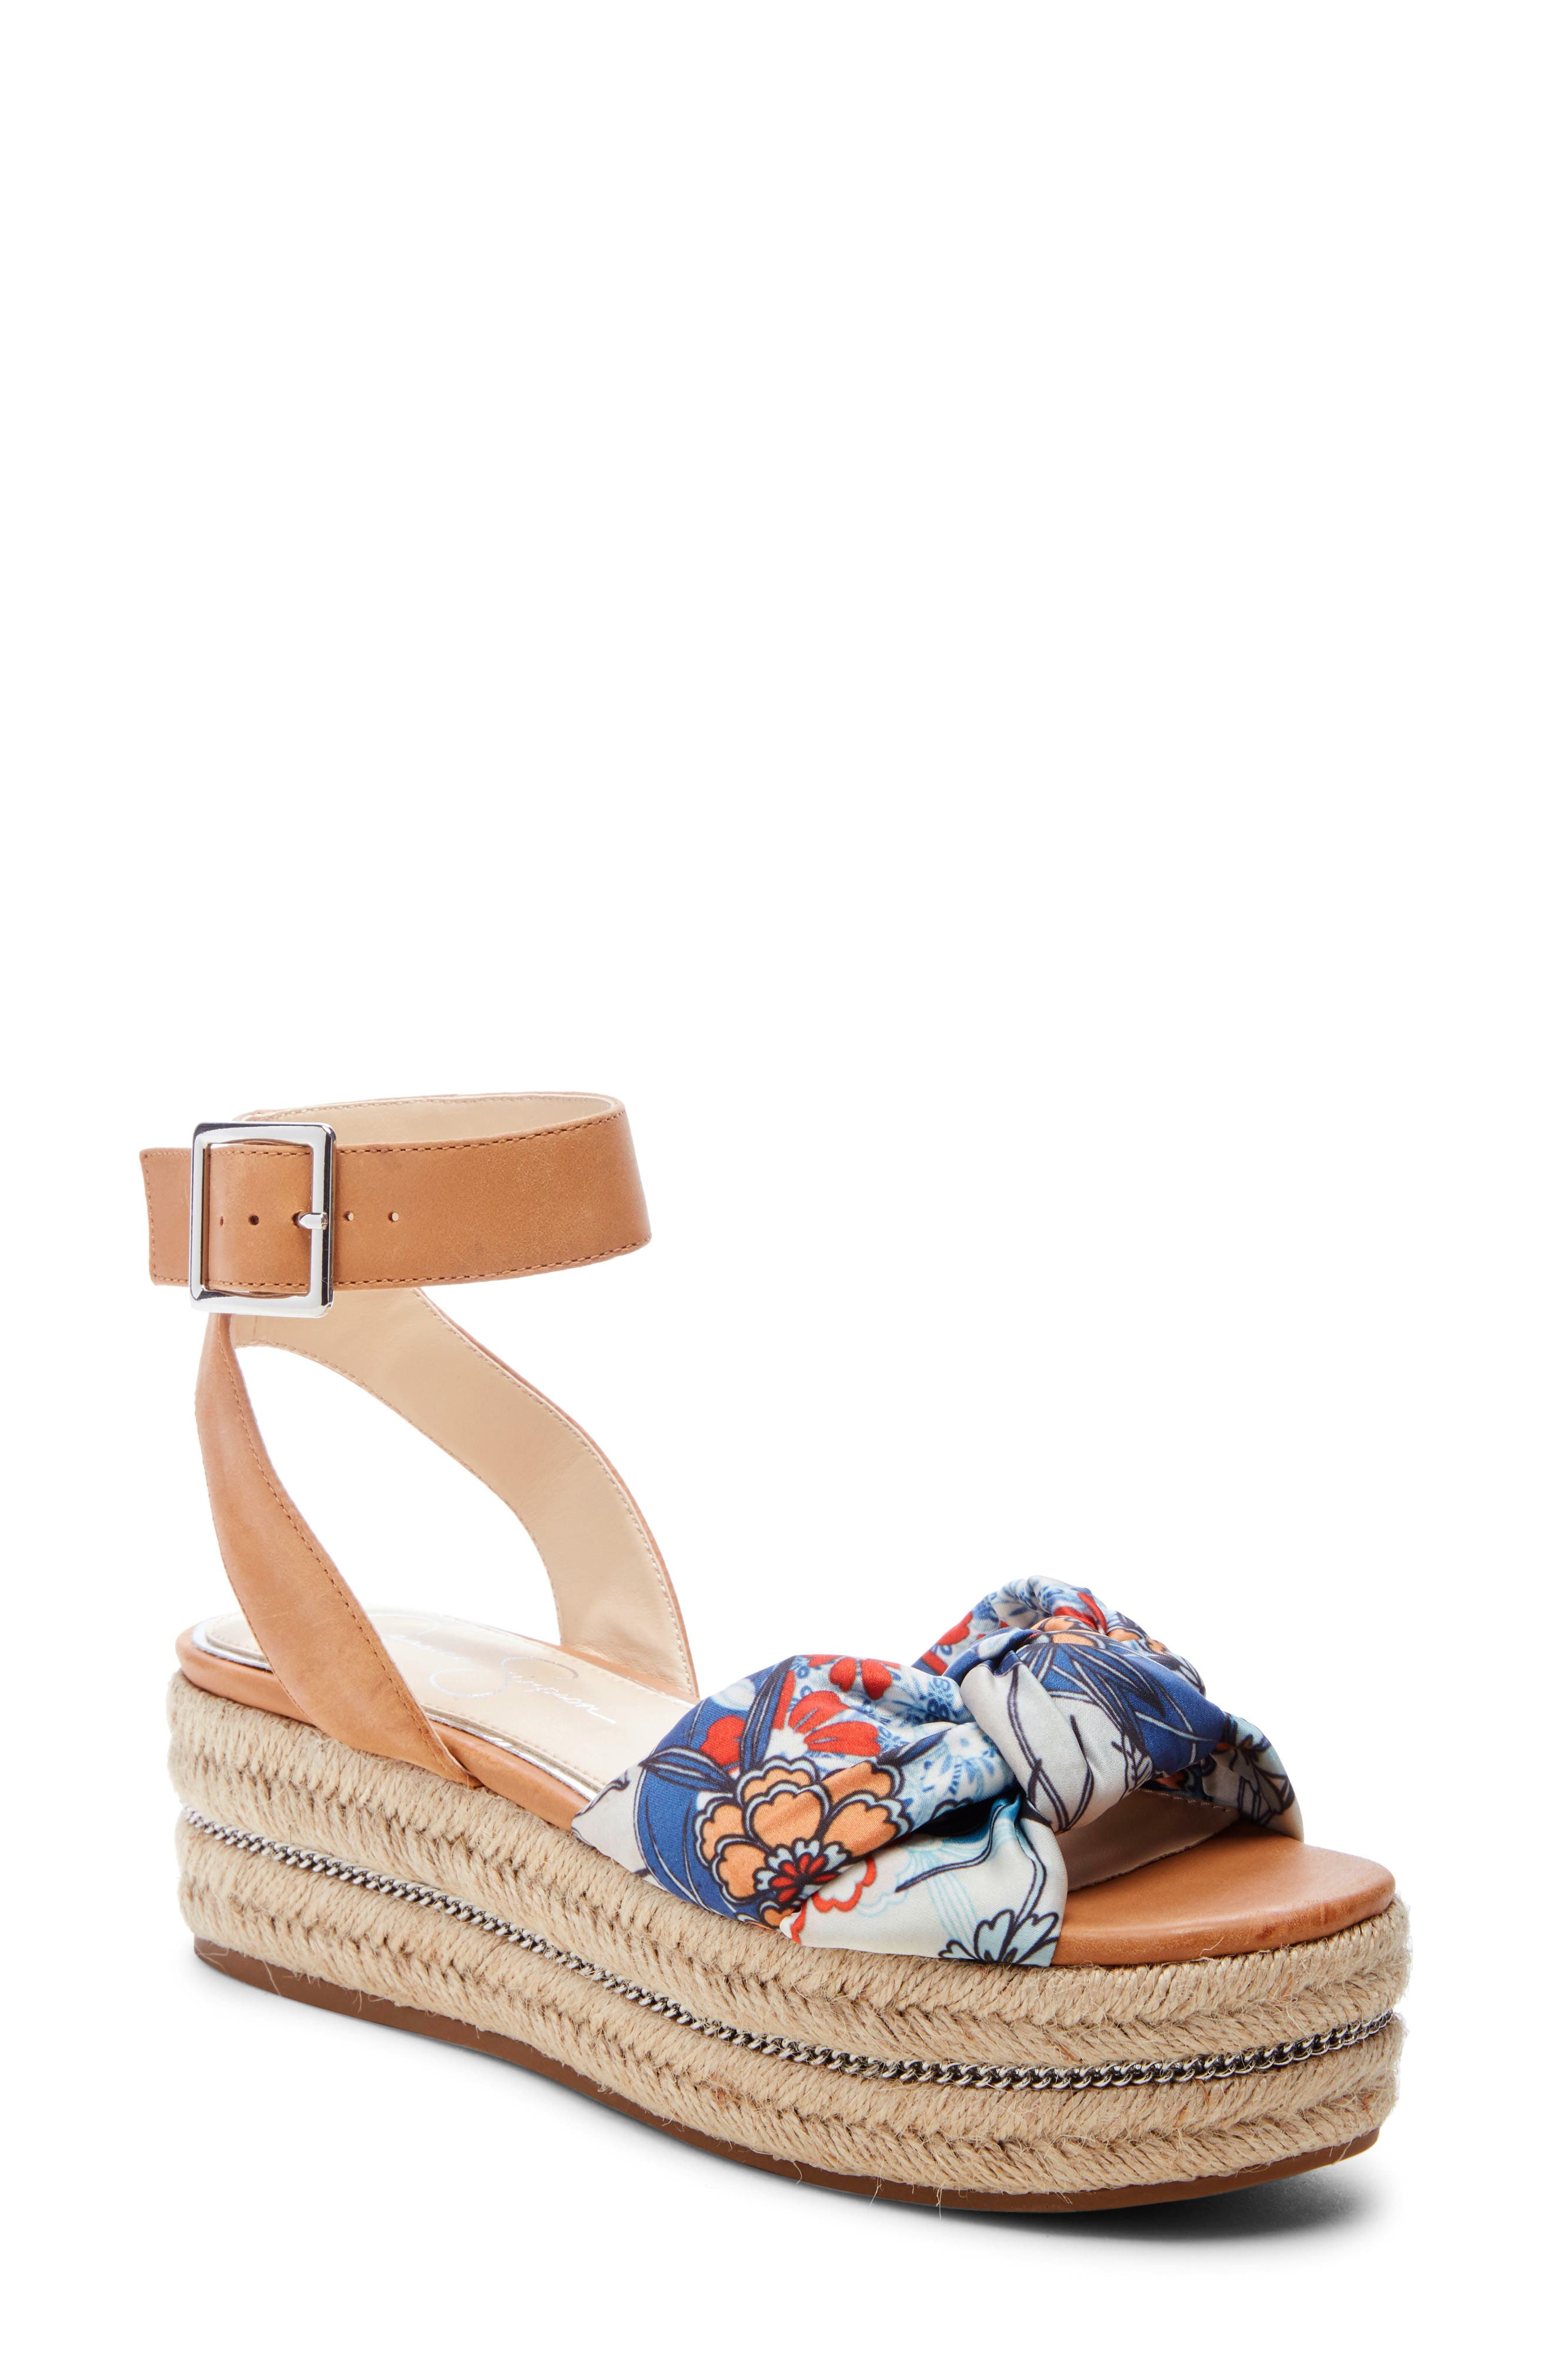 01a5378da64 Jessica Simpson Aprille Platform Ankle Strap Sandal